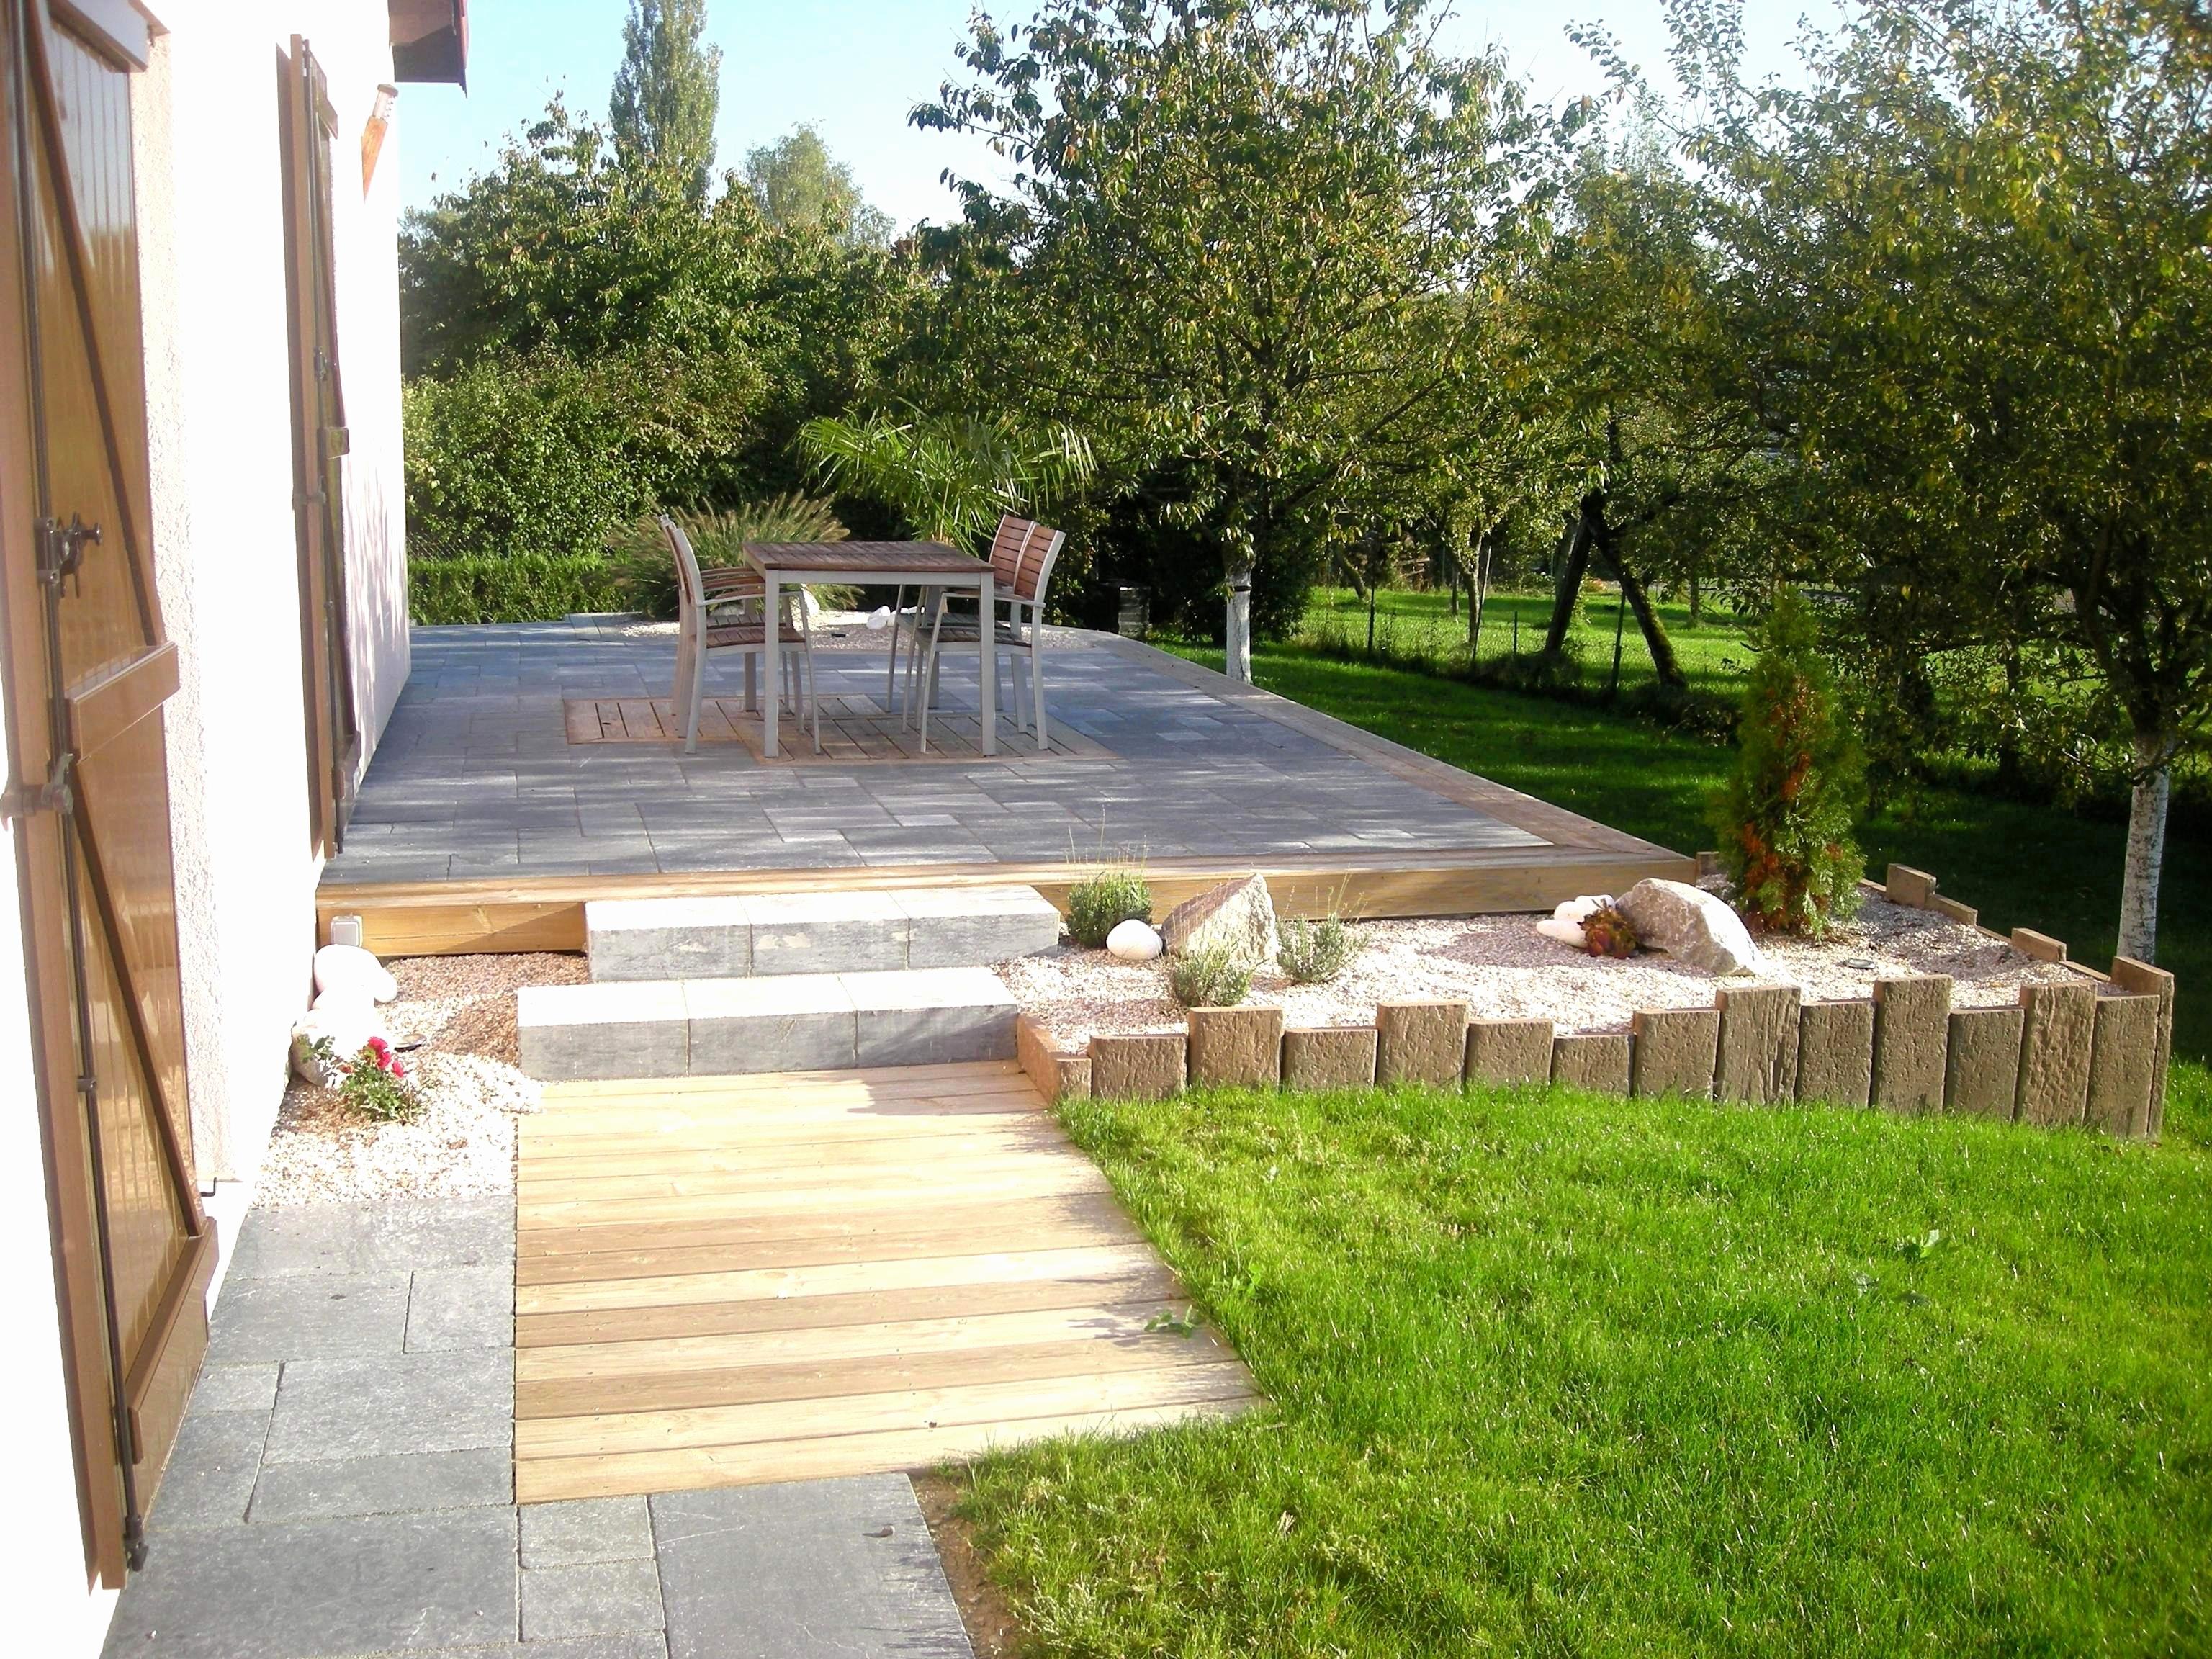 Abri Jardin Pas Cher Occasion Luxe Images Cloture De Jardin Pas Cher Nouveau Cabane De Jardin Occasion